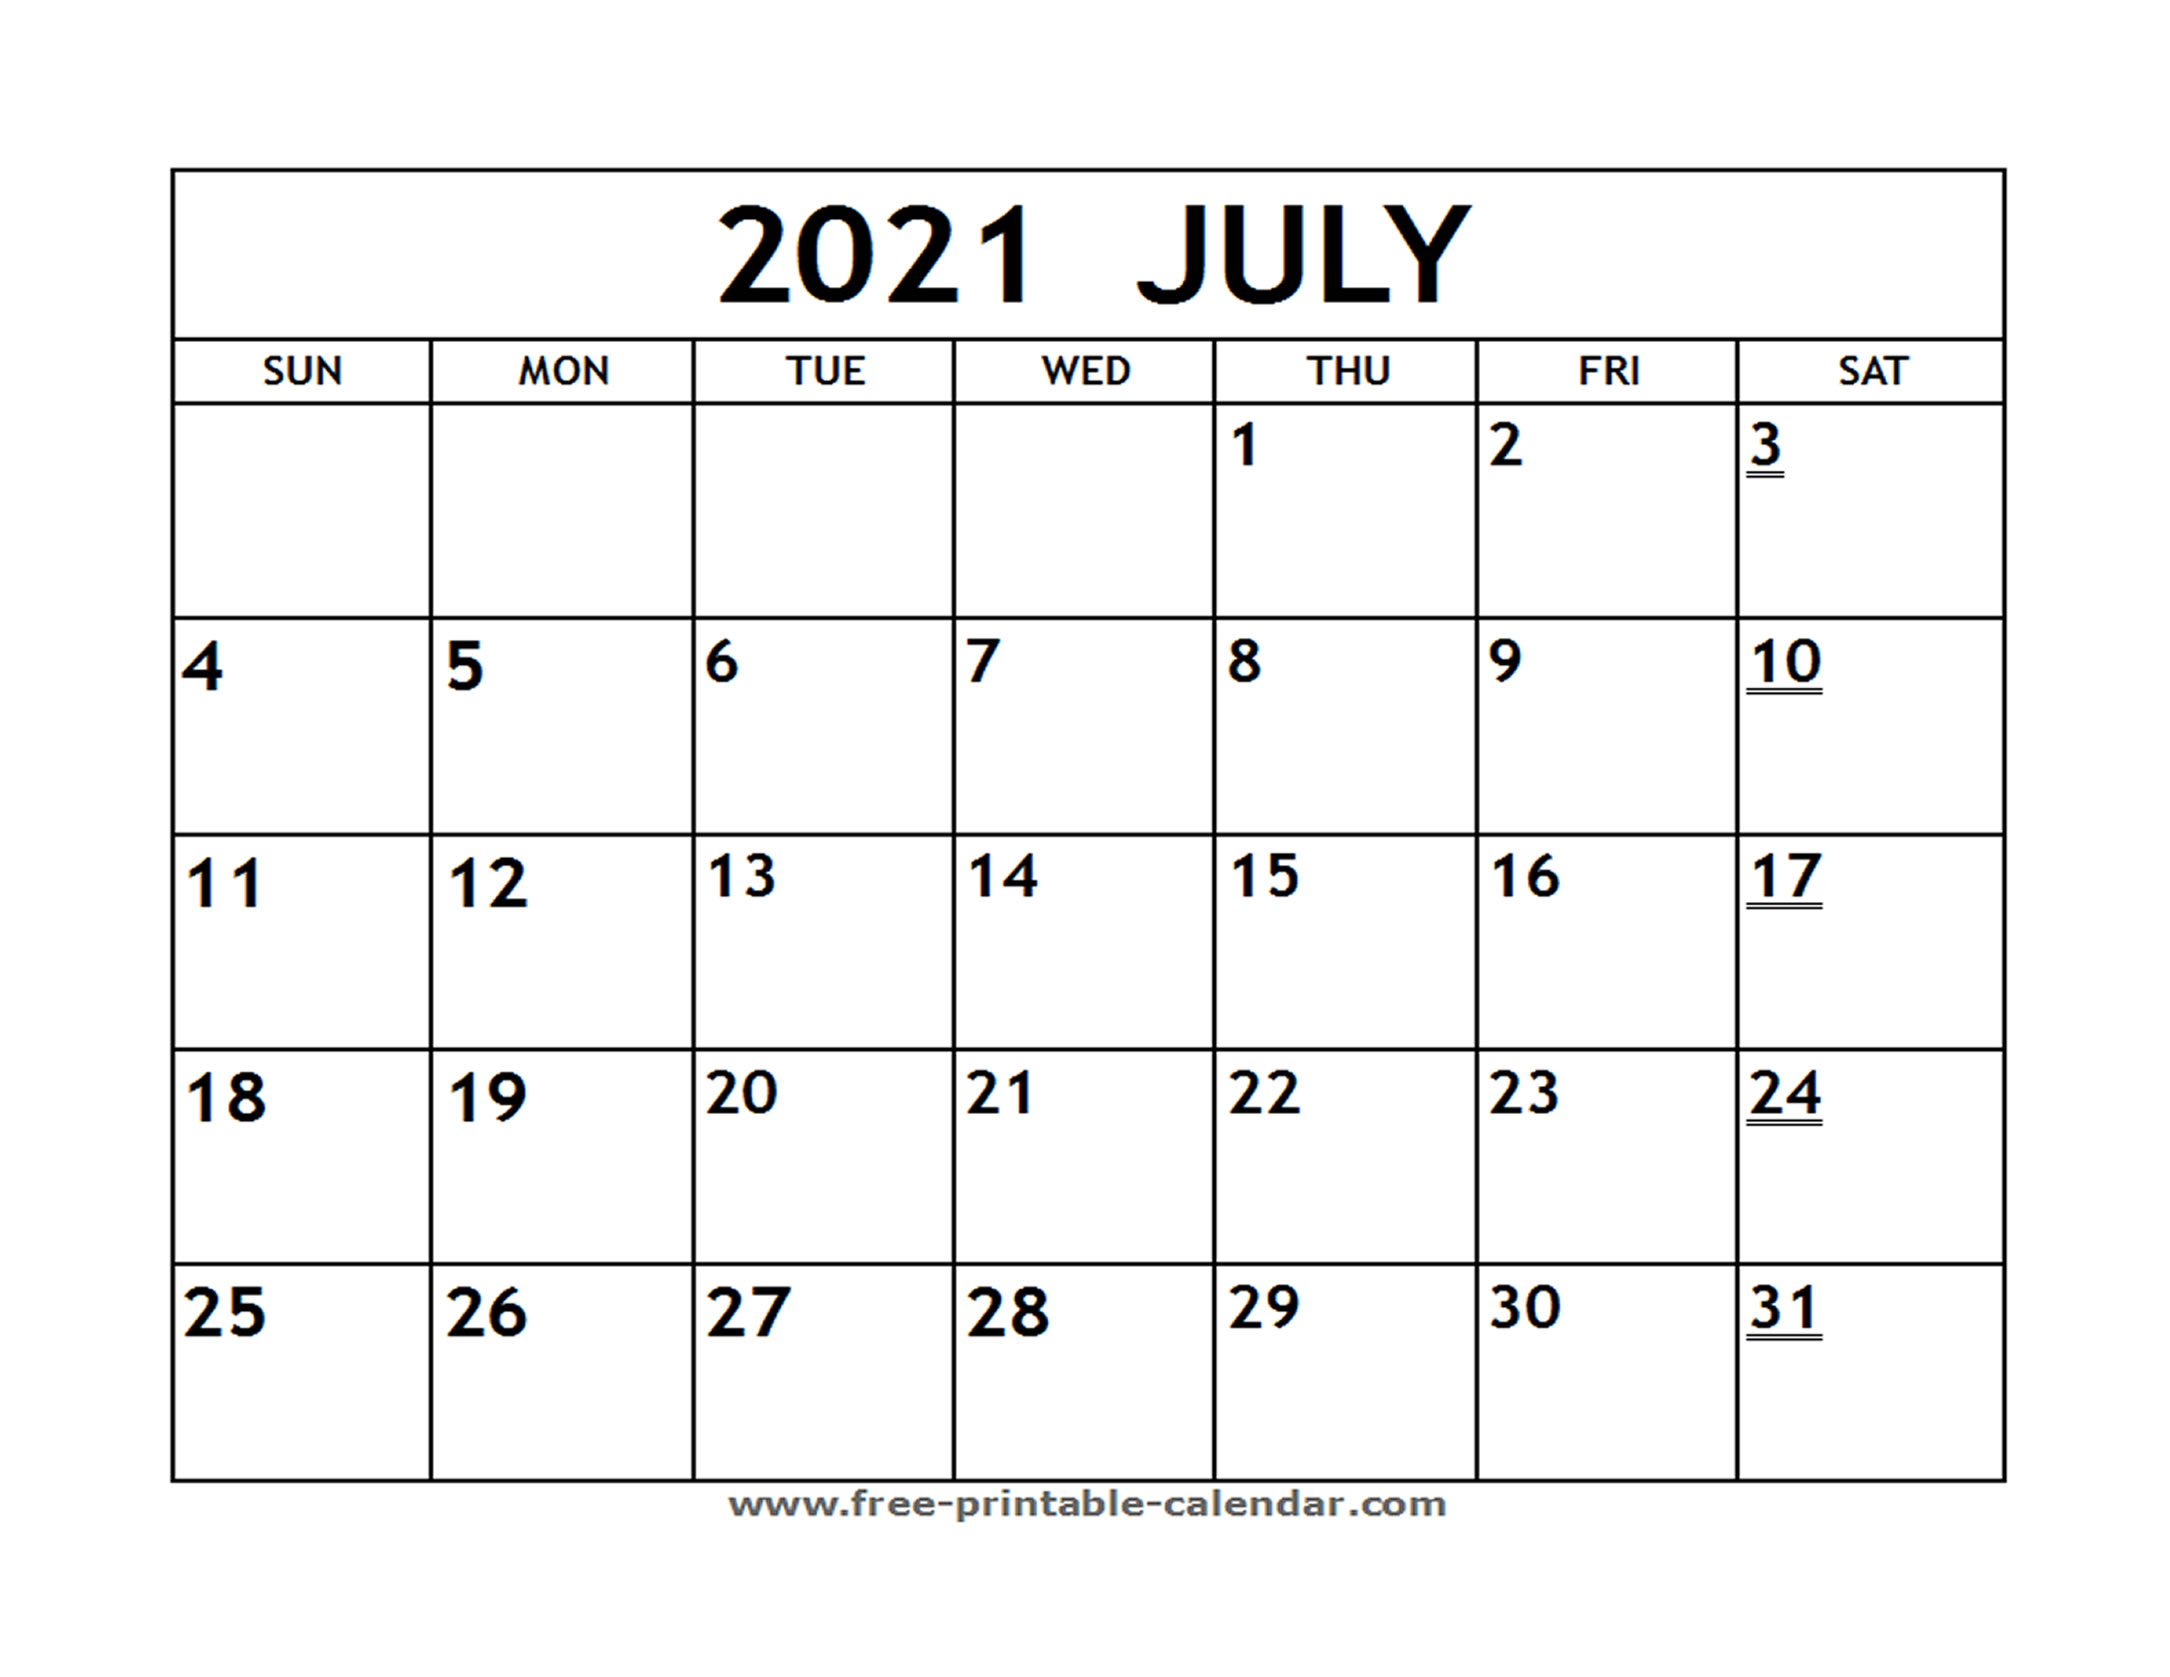 Printable 2021 July Calendar - Free-Printable-Calendar throughout August 2021 Fill In Calendar